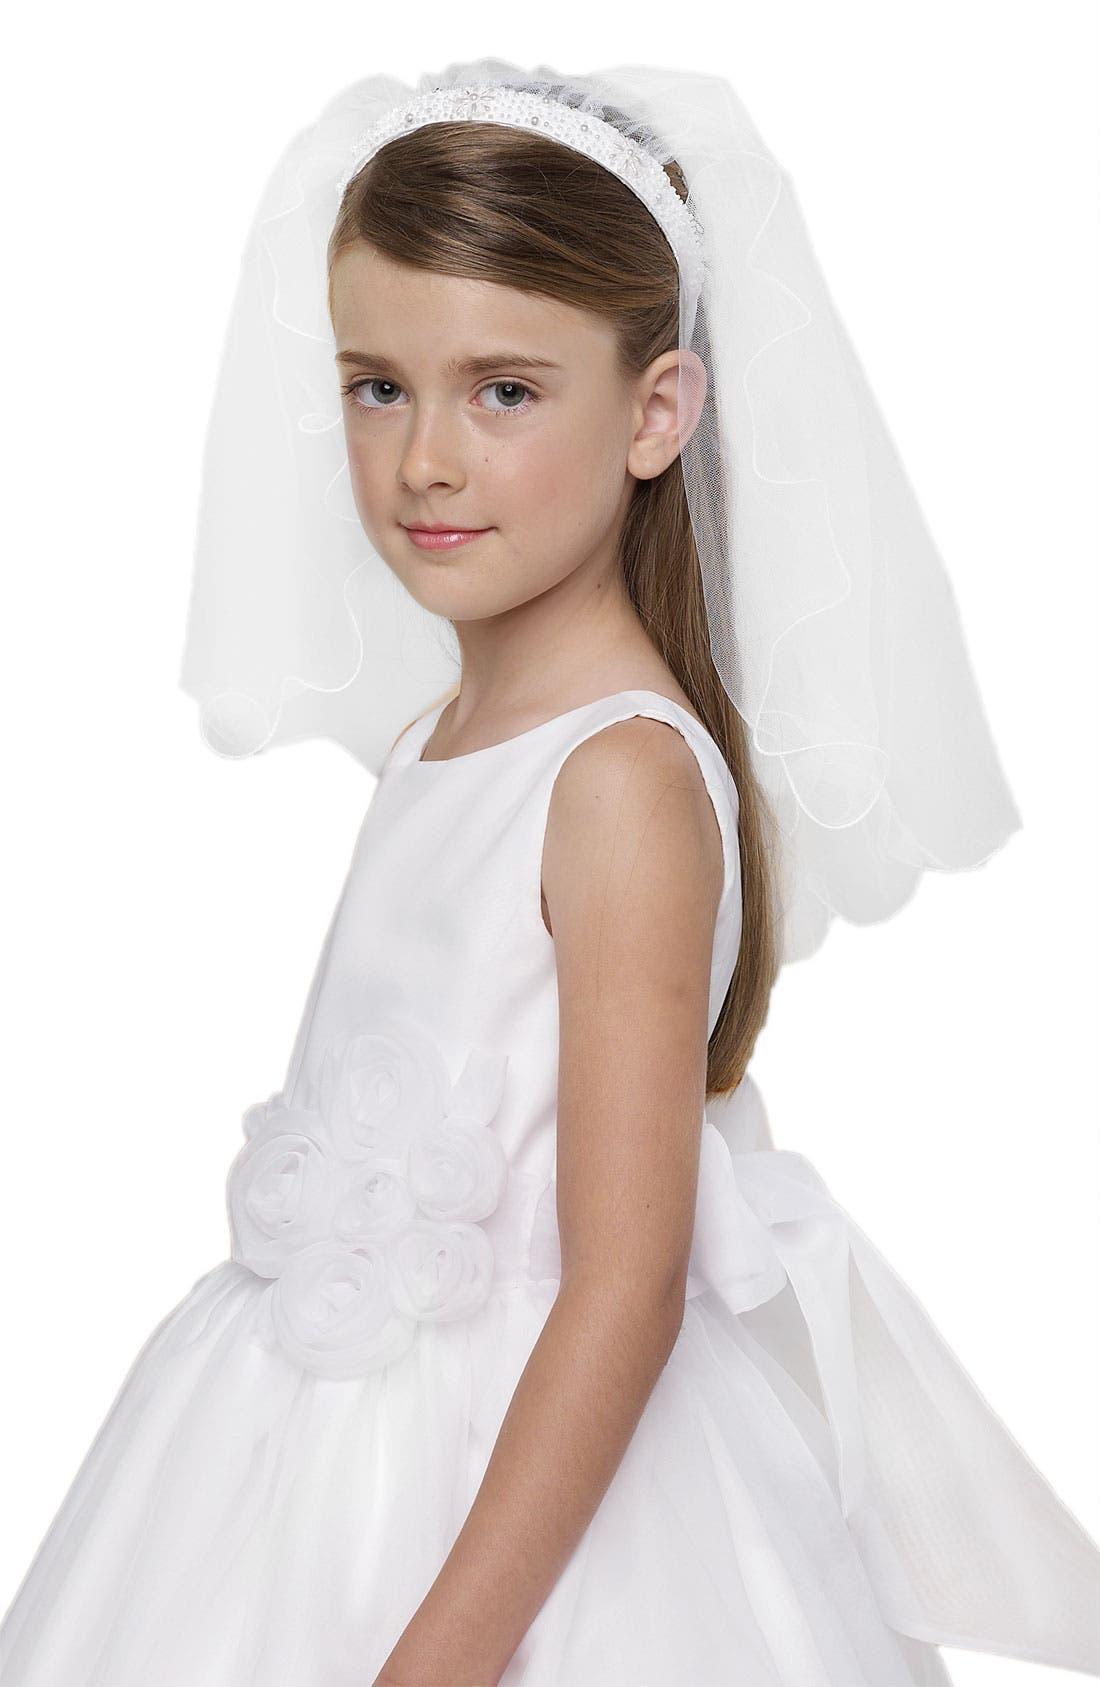 Alternate Image 1 Selected - Us Angels Beaded Communion Veil (Little Girls & Big Girls)